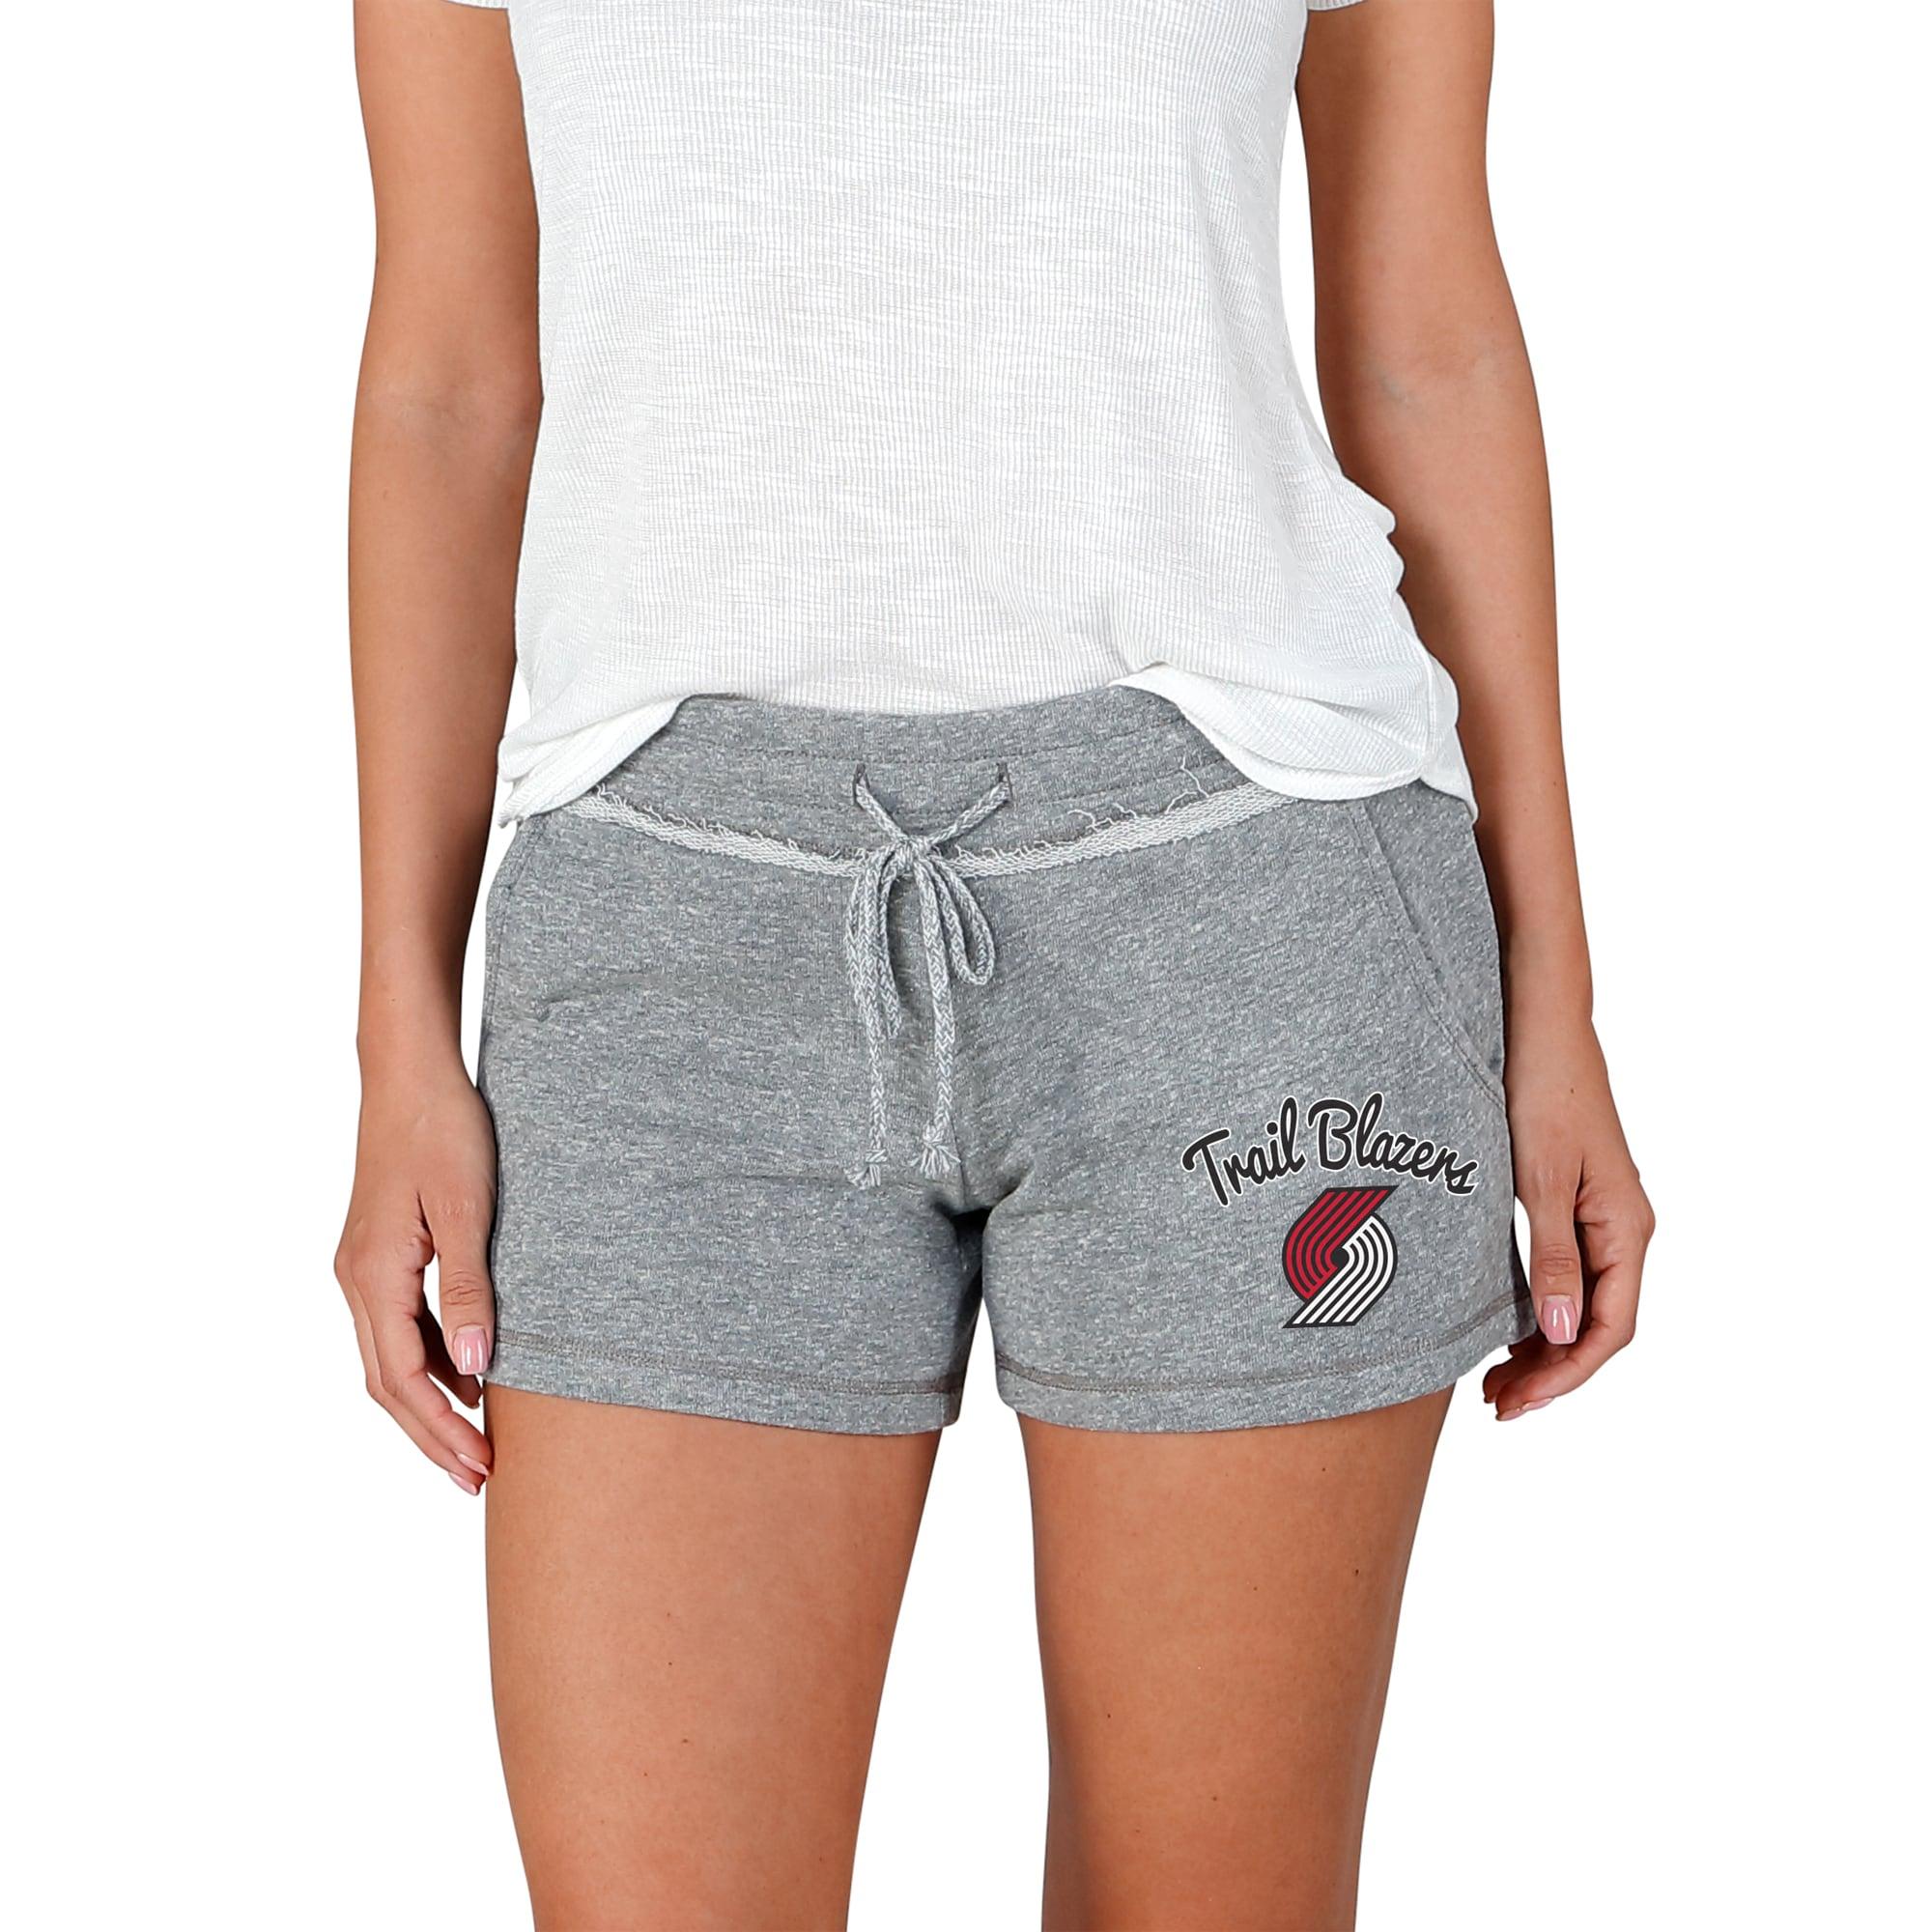 Portland Trail Blazers Concepts Sport Women's Mainstream Terry Shorts - Gray